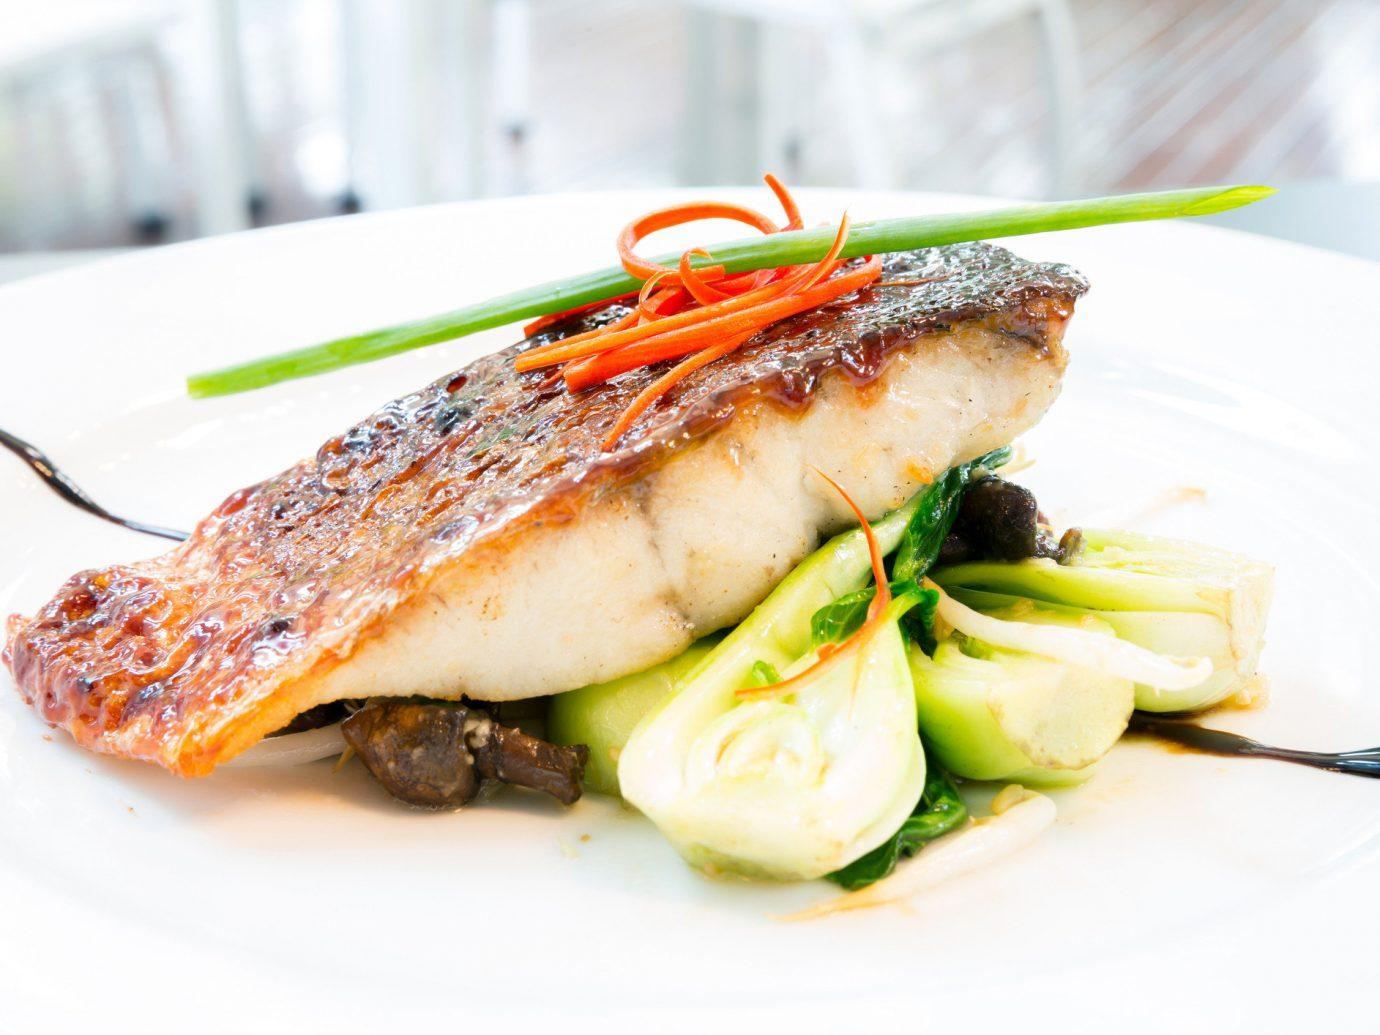 Food + Drink plate food dish garnish Seafood recipe vegetable piece de resistance